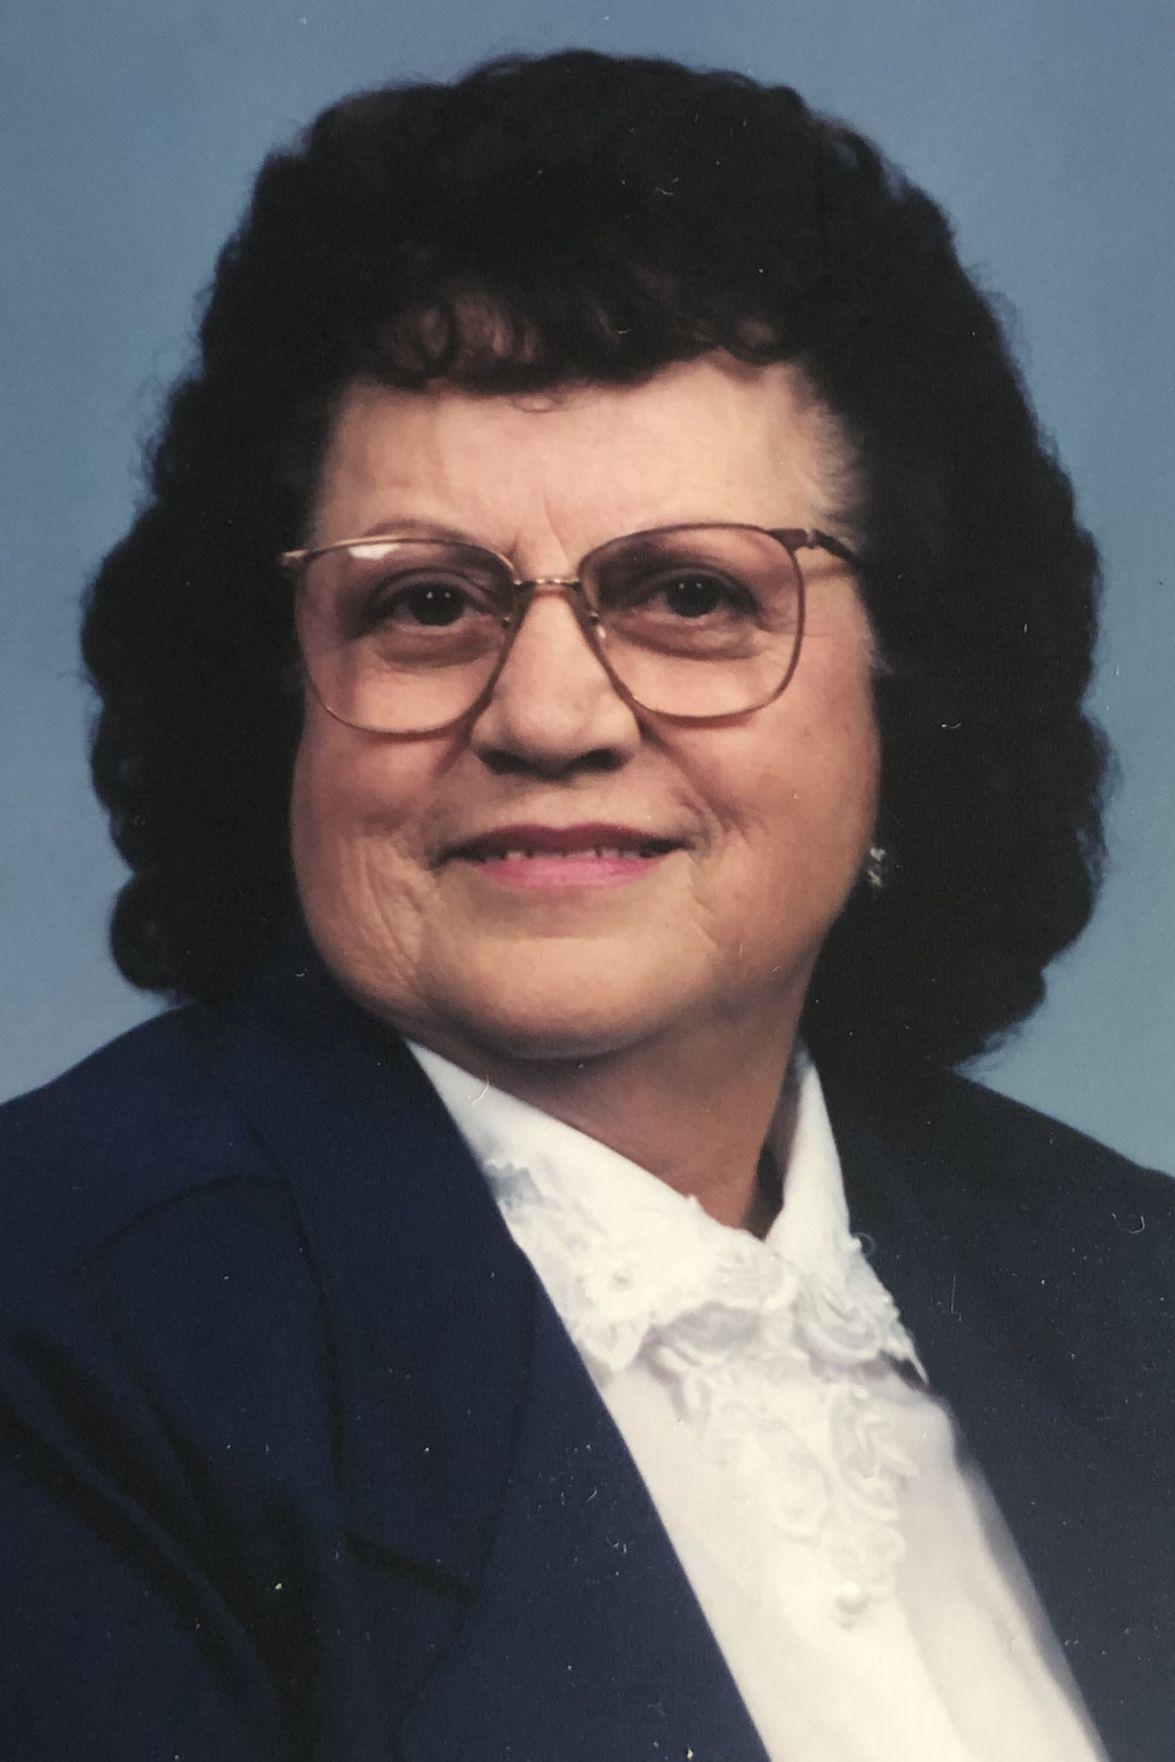 Amber Marie Goetz chippewa falls neighbors: recently published obituaries